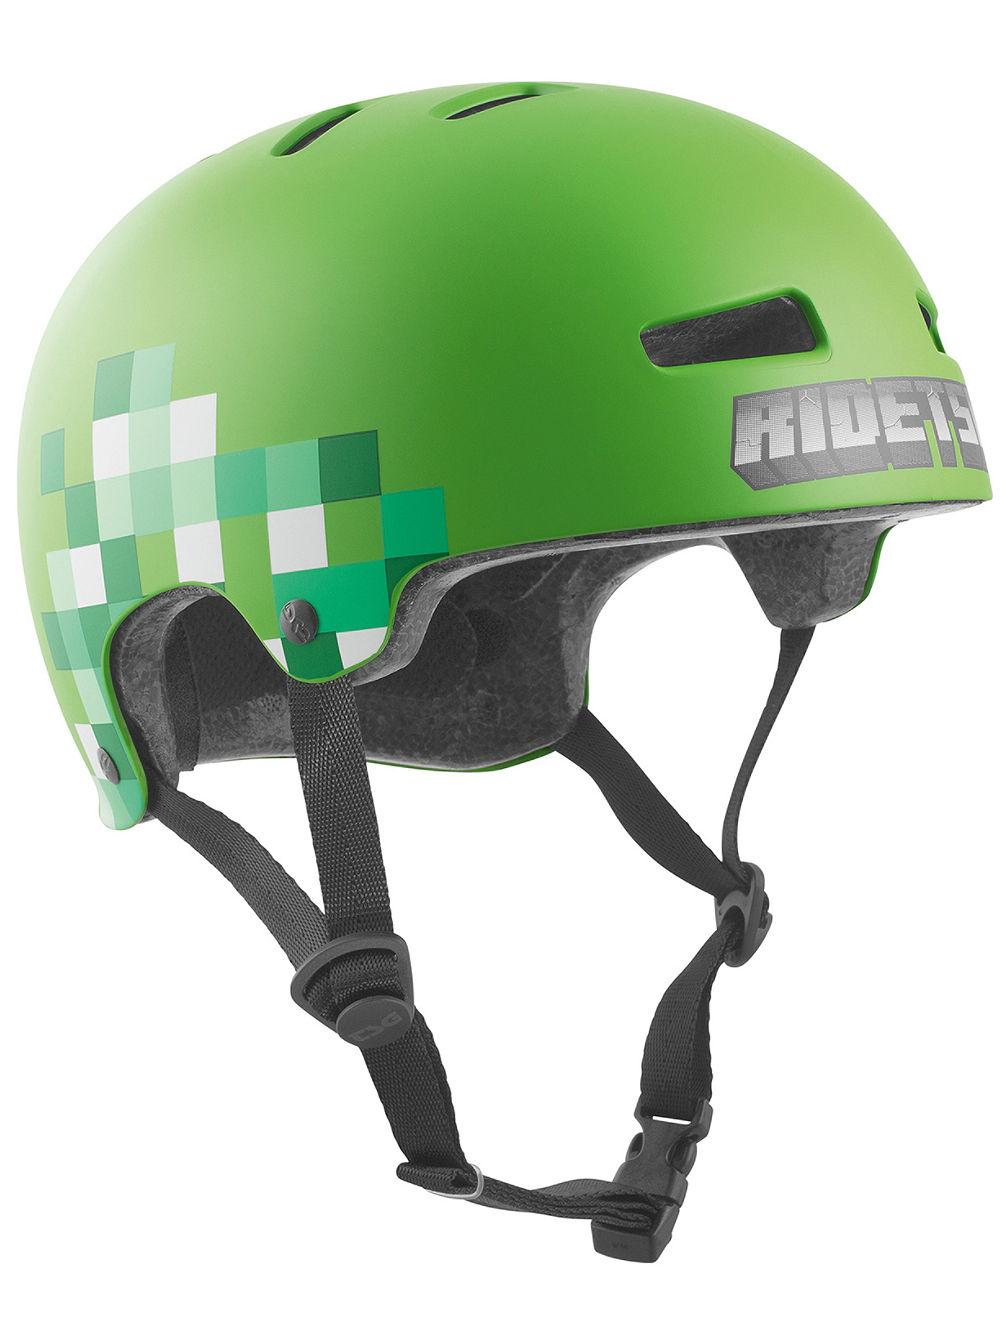 Buy TSG Evolution Graphic Design Helmet Youth online at ...